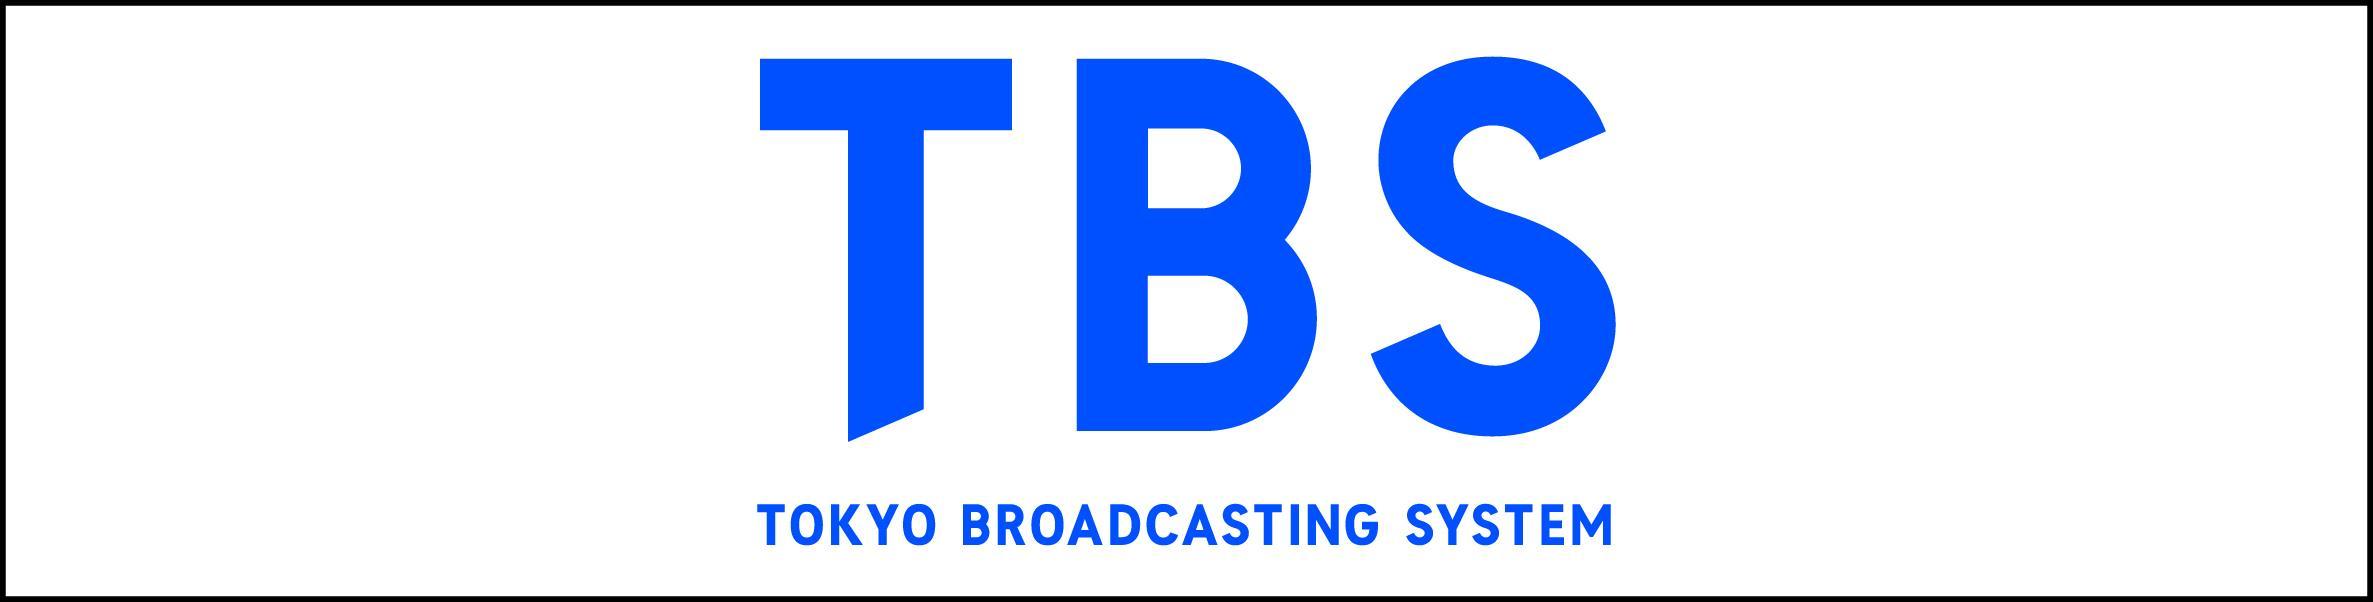 TBS-New Logo 2020 ()